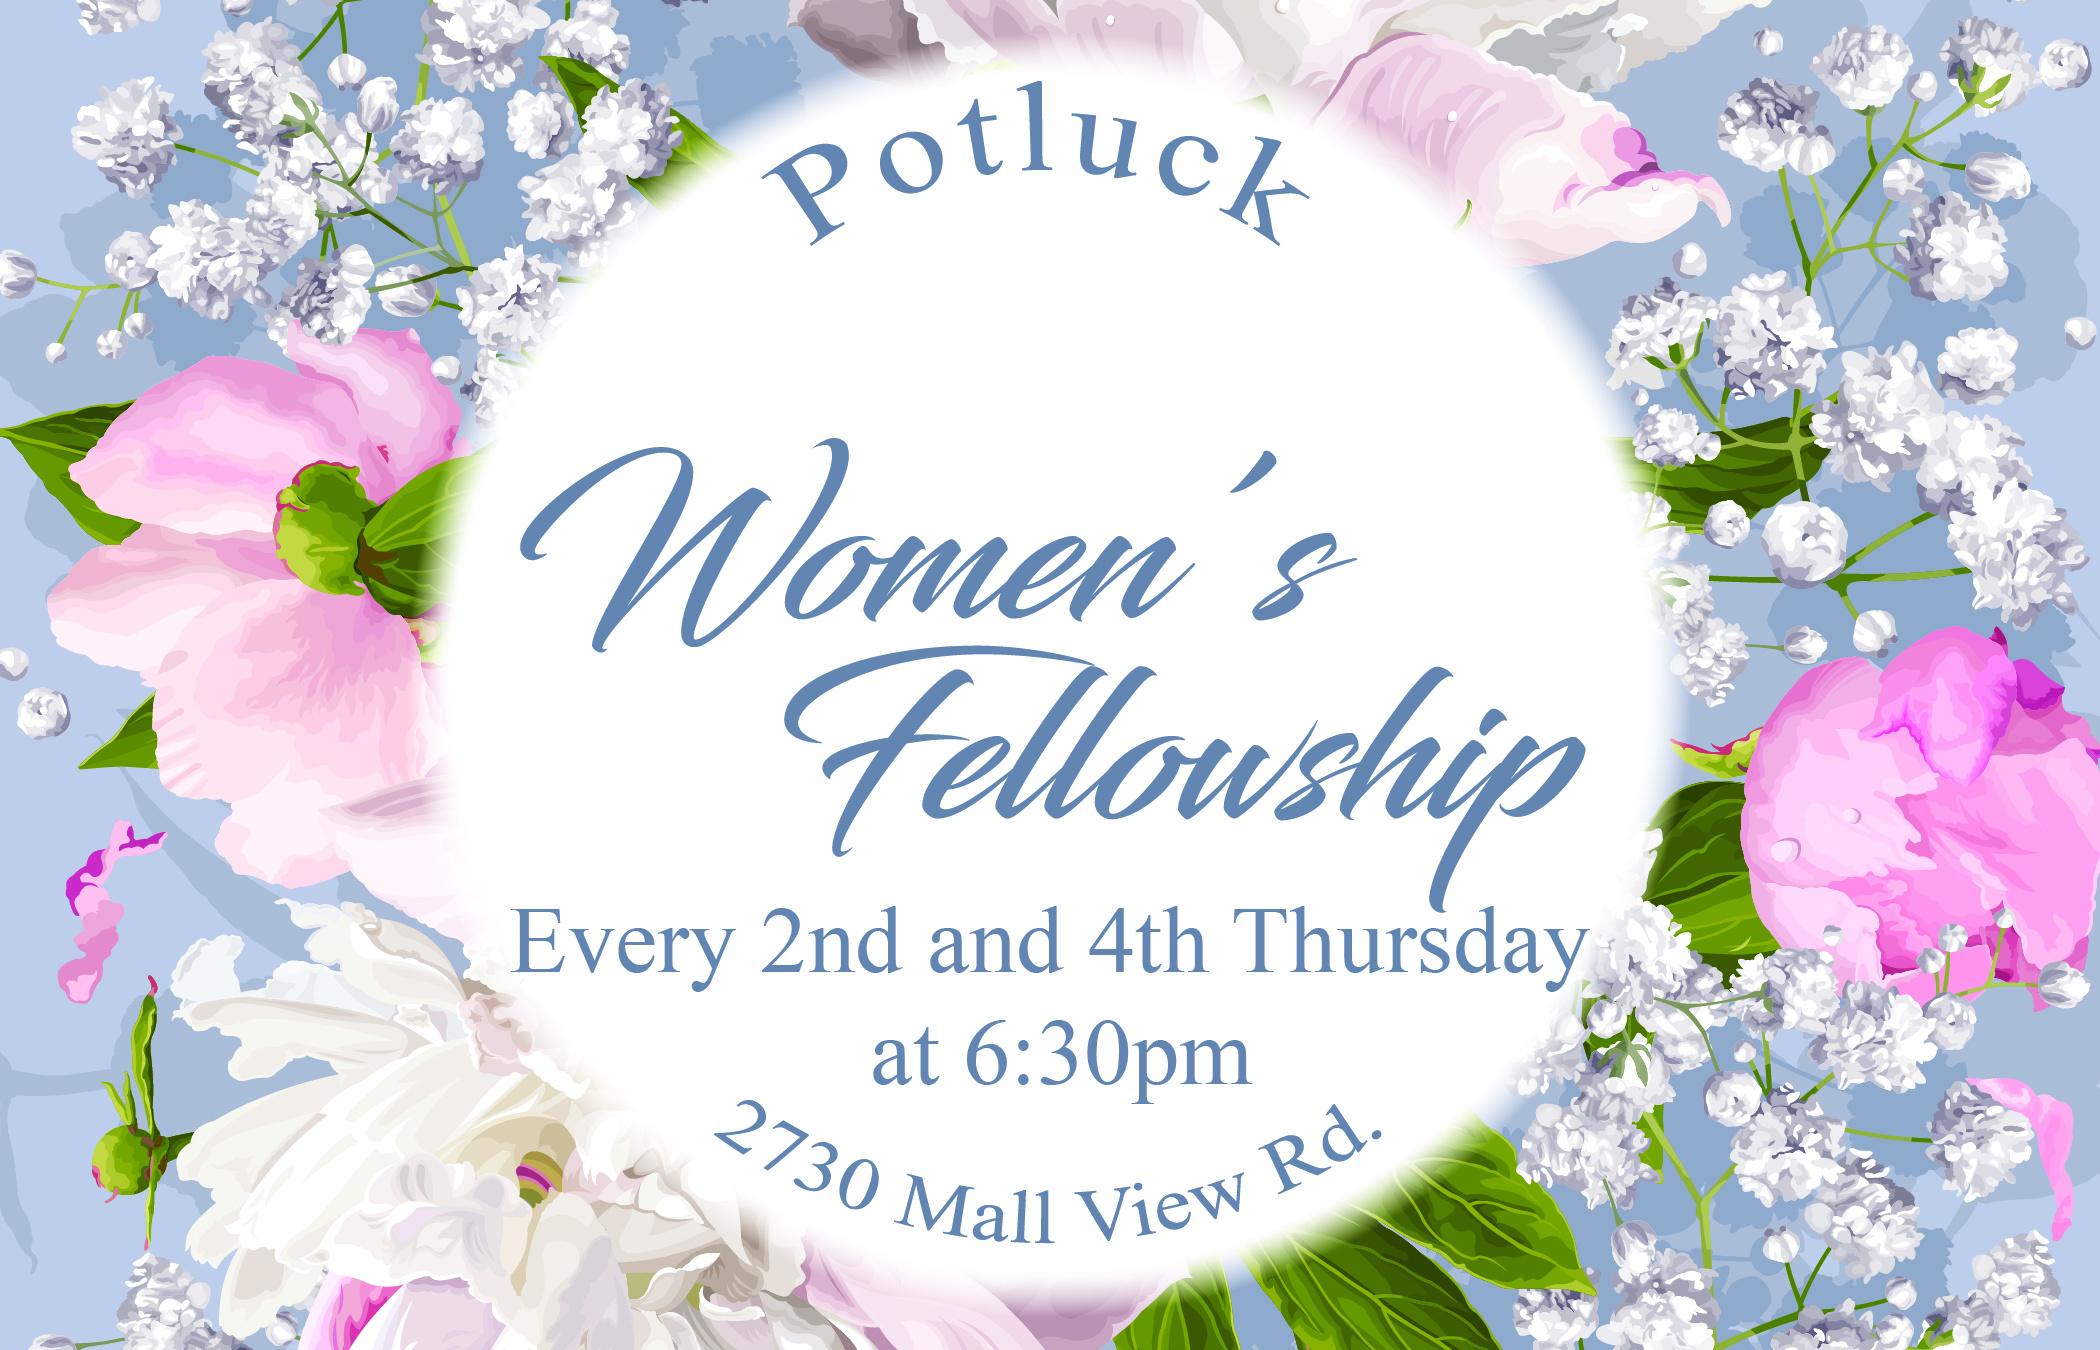 Womans Fellowship-01